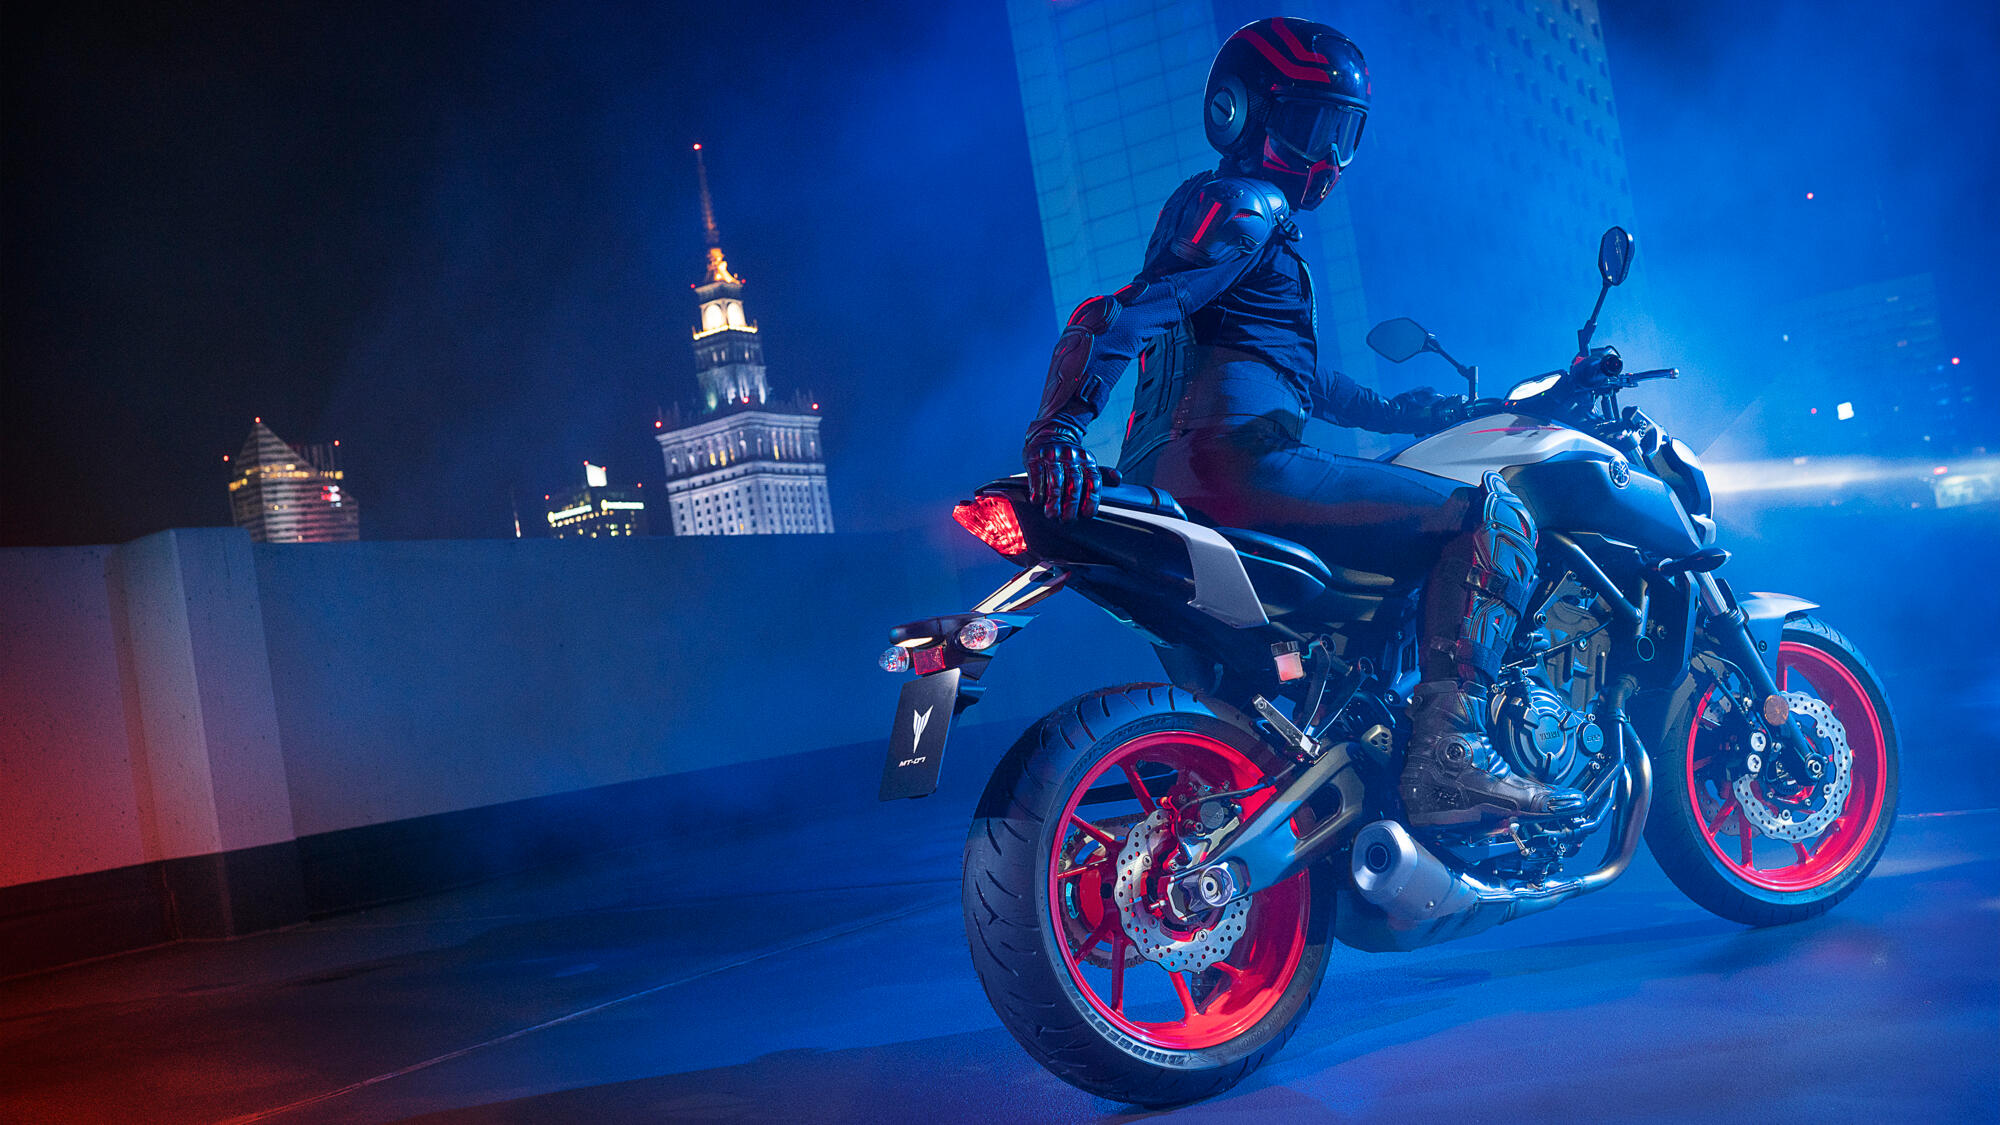 yamaha mt 07  MT-07 - Motorcicli - Yamaha Motor